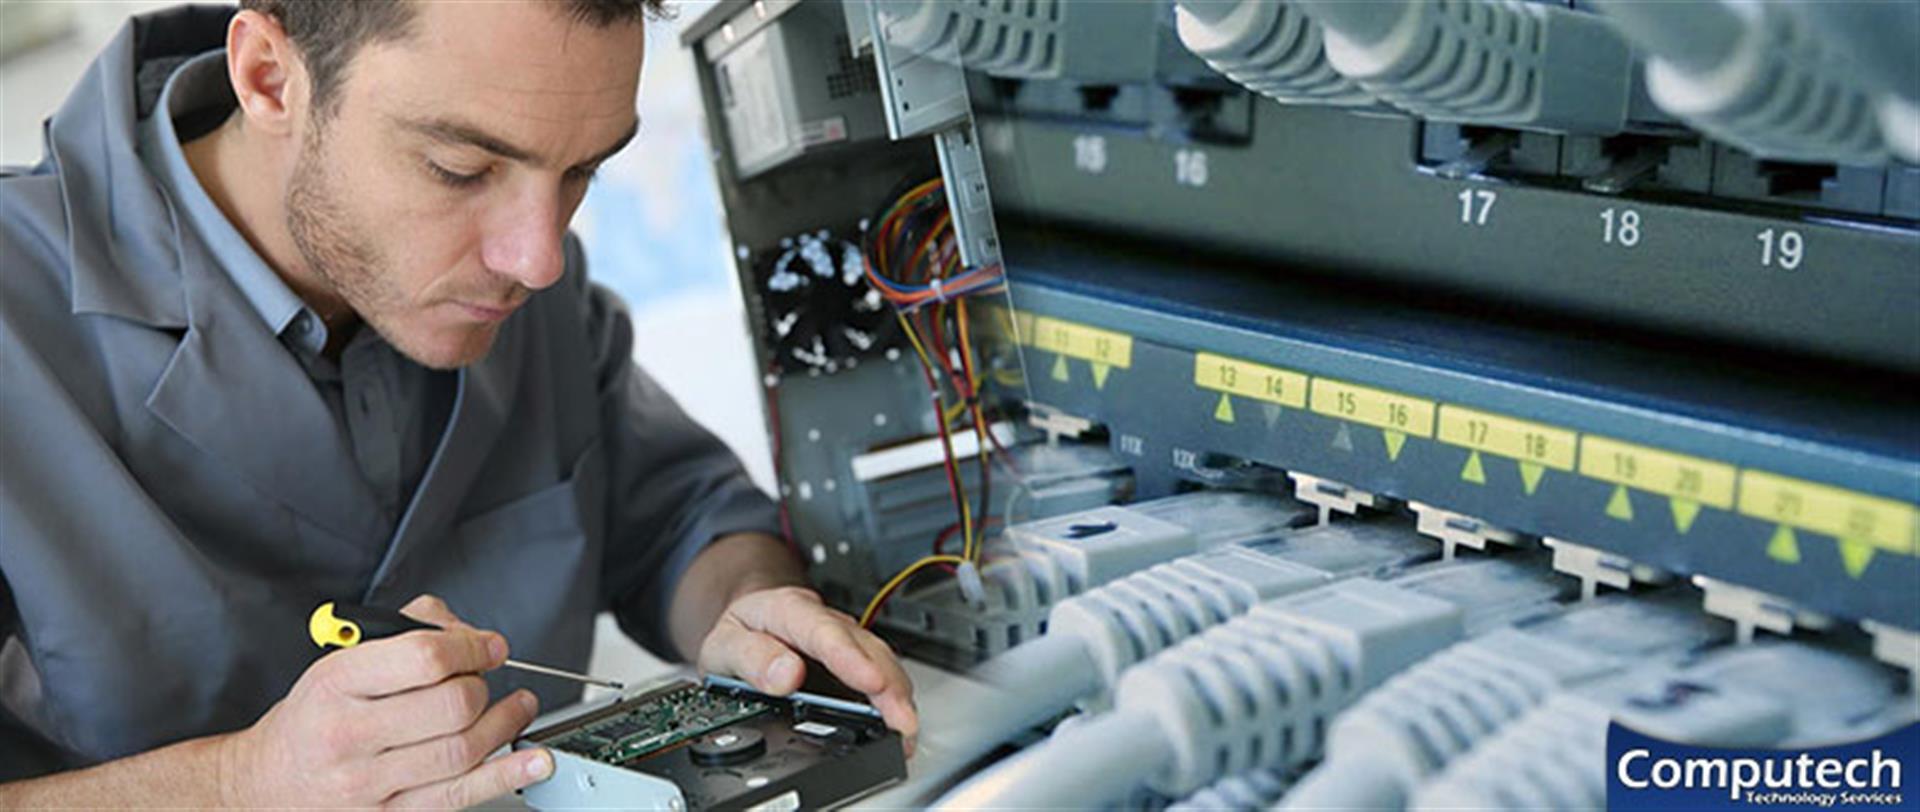 Lake Havasu City Arizona On-Site Computer & Printer Repairs, Network, Telecom and Broadband Data Cabling Services